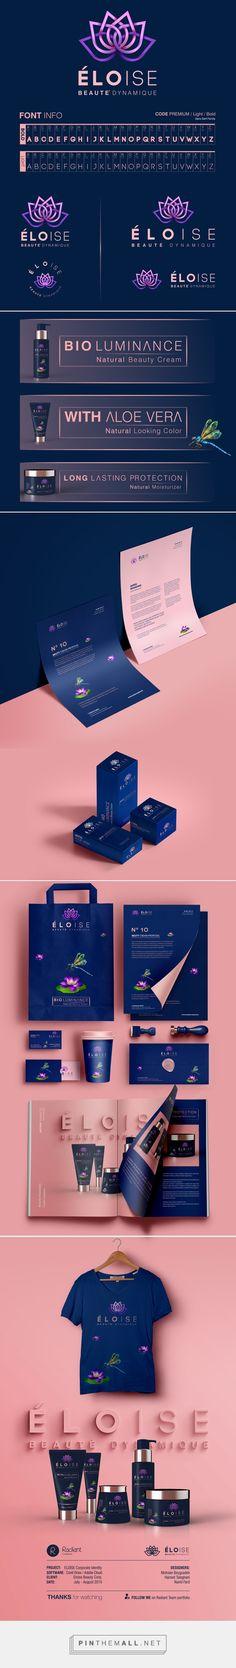 ELOISE Corporate Identity on Behance | Fivestar Branding – Design and Branding Agency & Inspiration Gallery